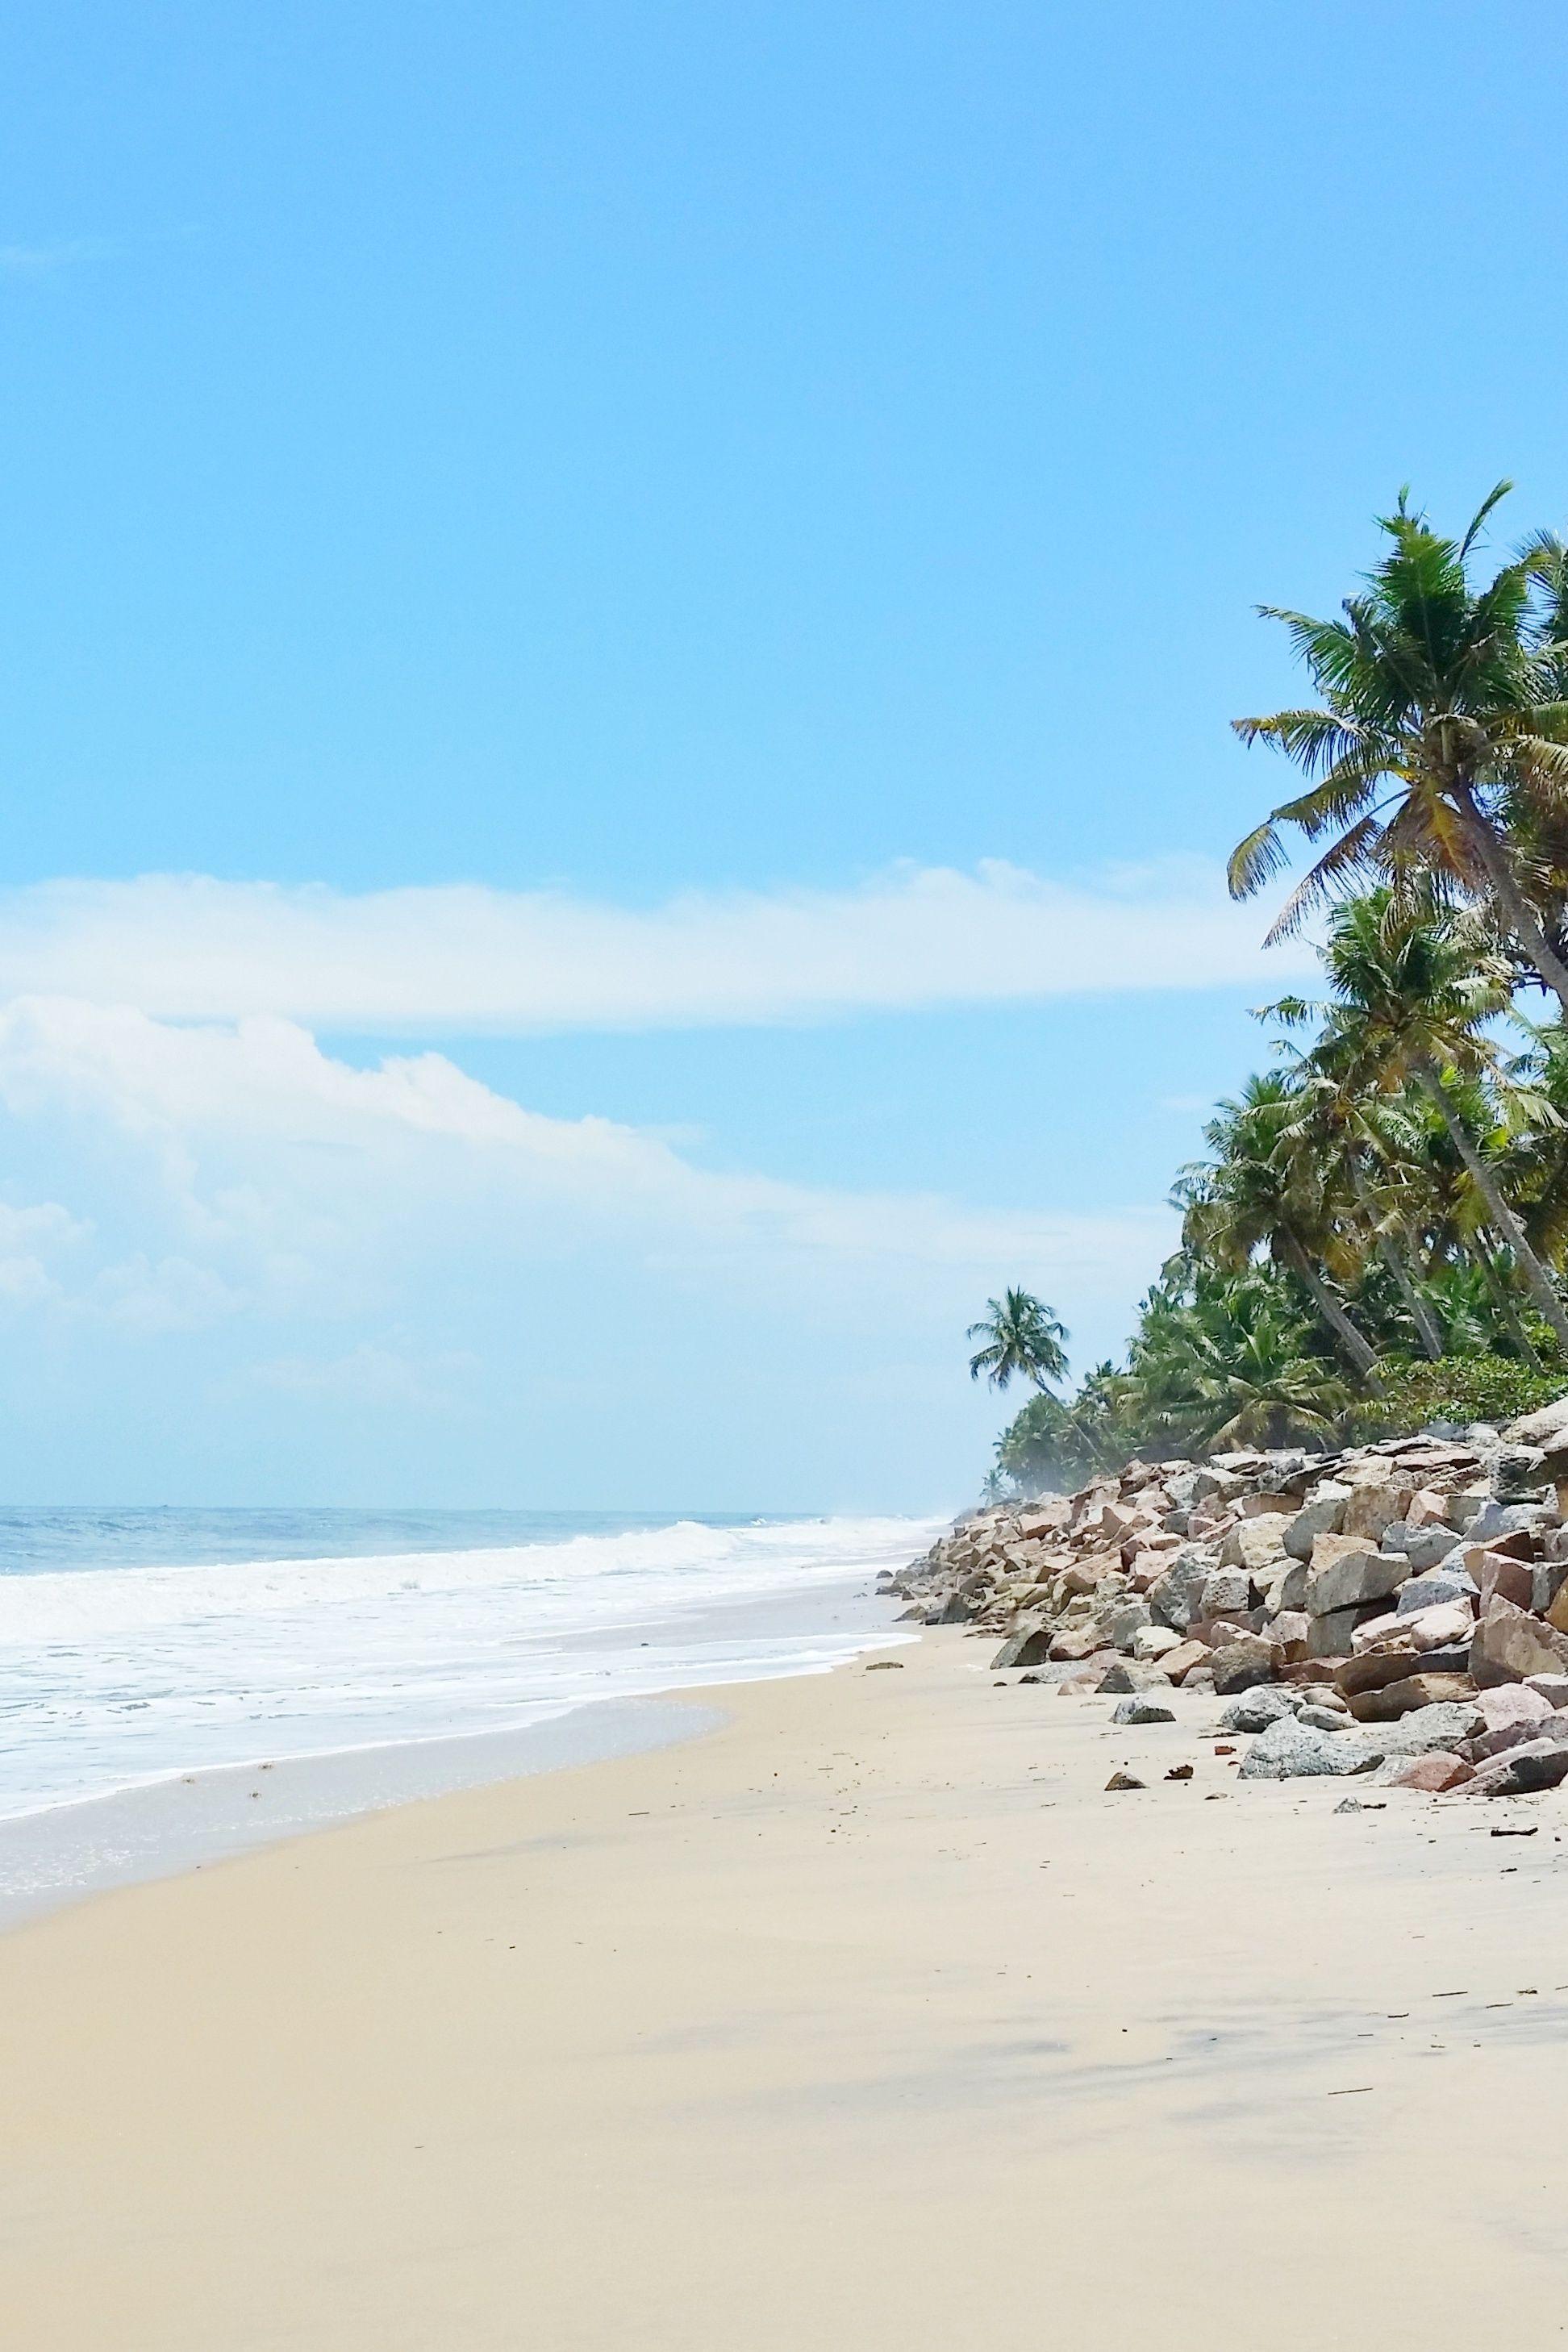 Kerala India beach picture